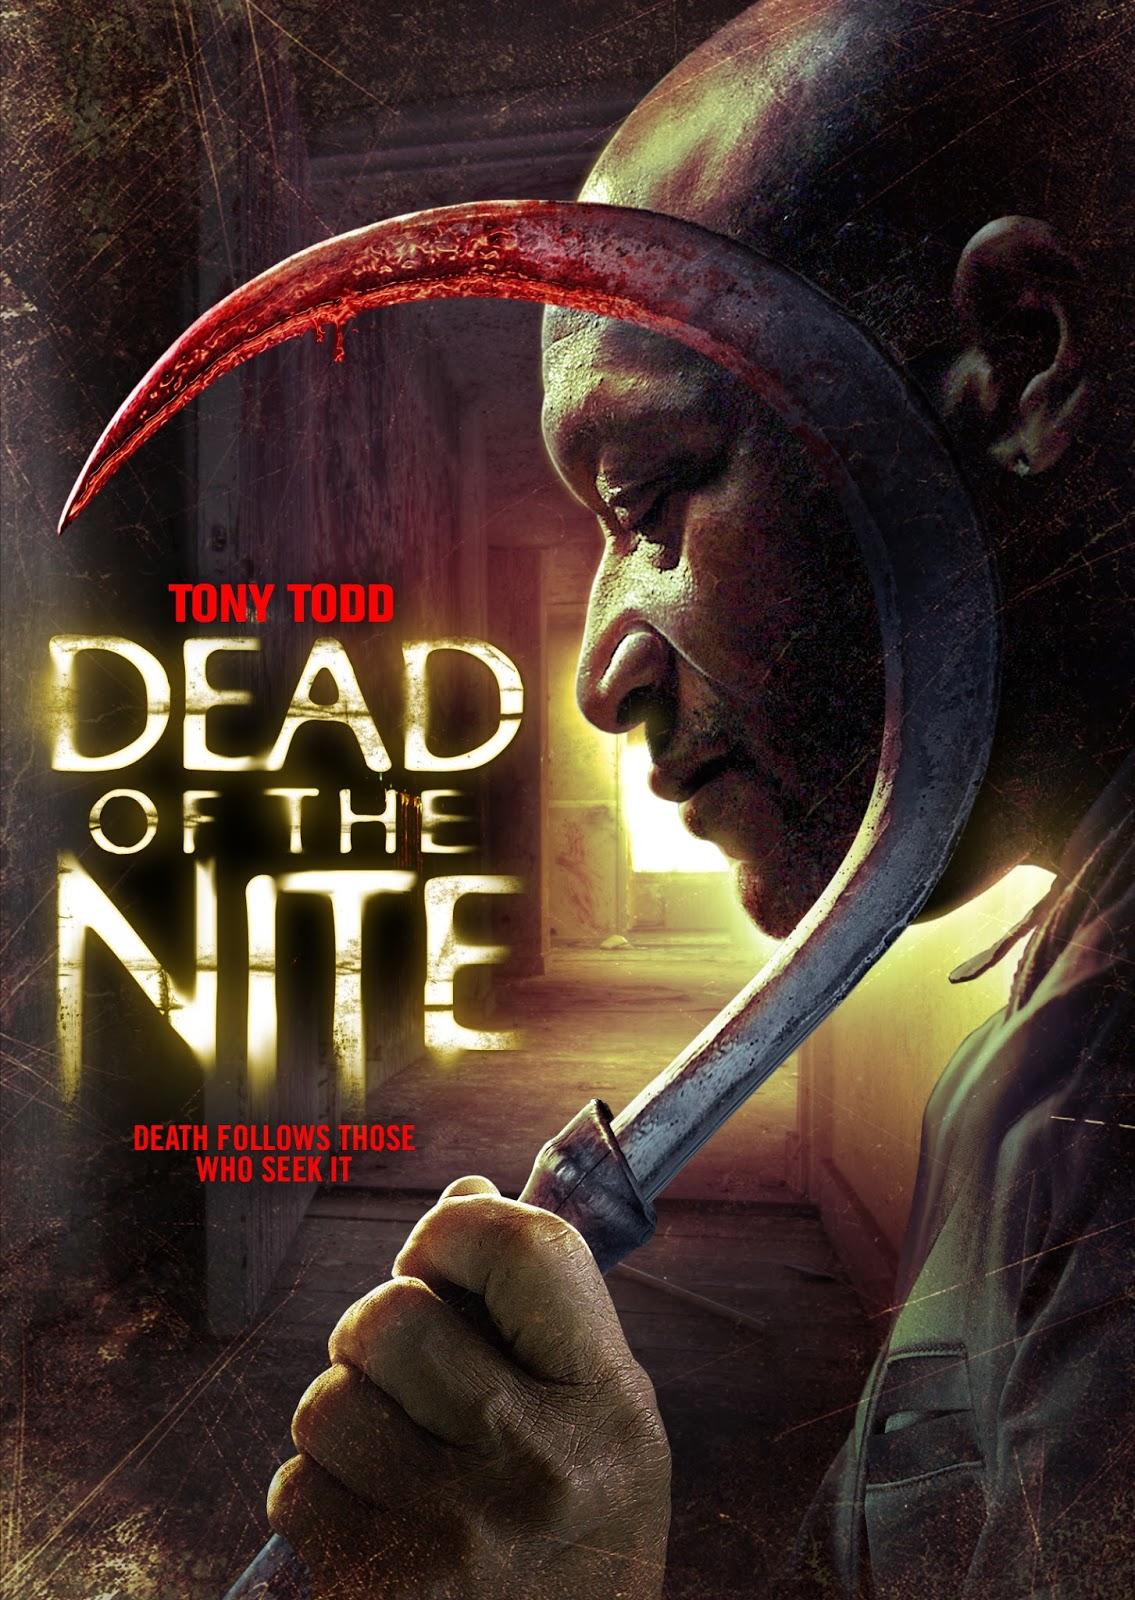 Dead of the Nite (2013)